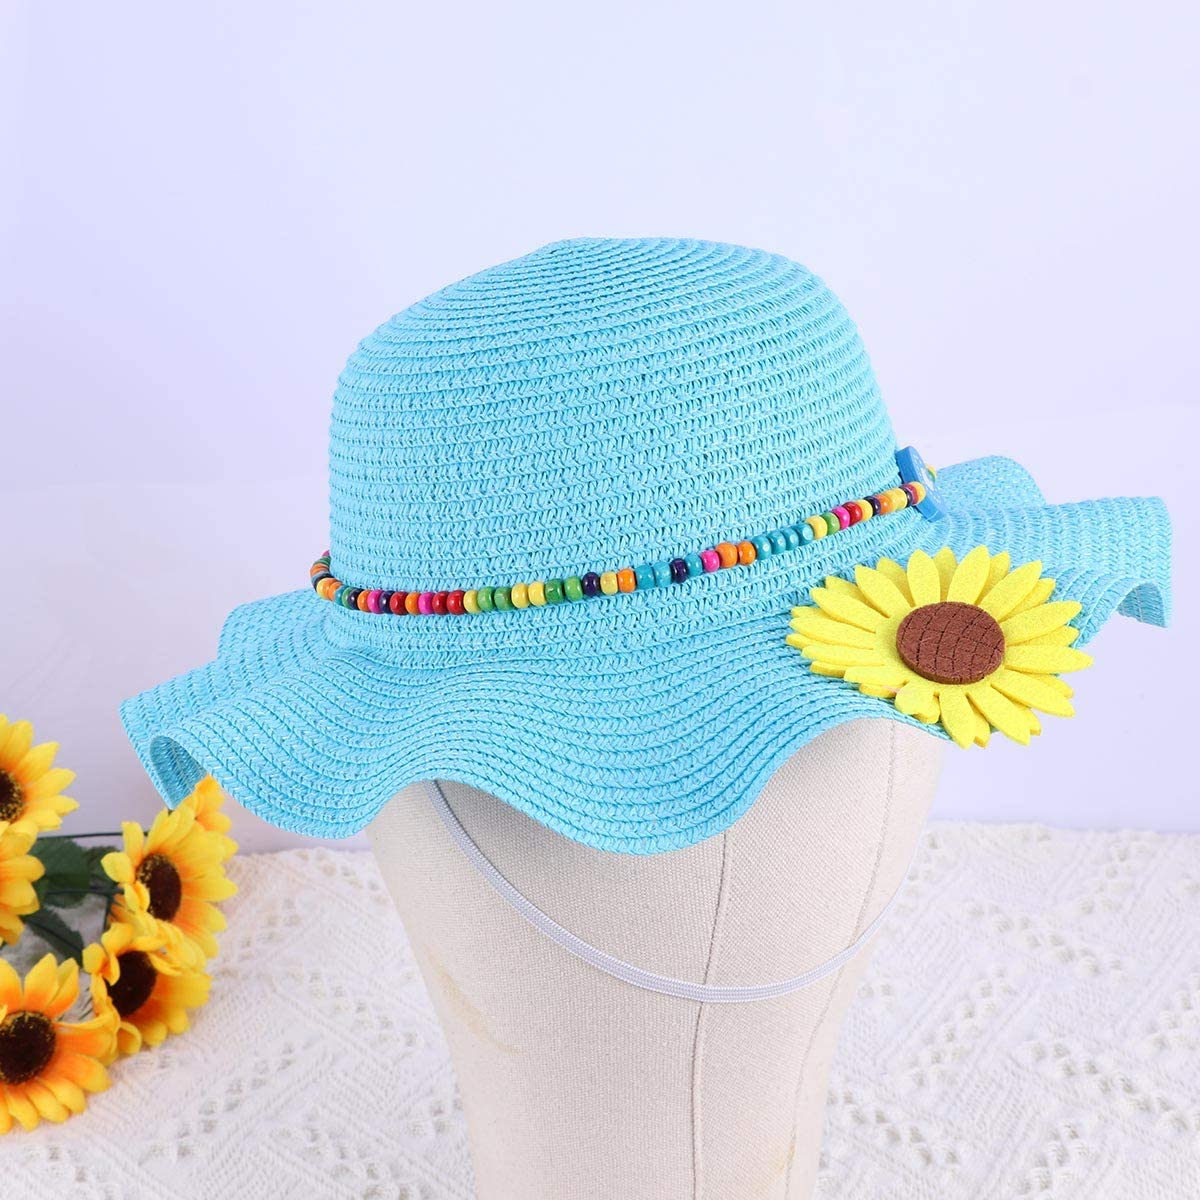 FENICAL Kids Sun Hat Beach Straw Summer Cap Floppy Sun Hat Sunflower Beads for Childern 1pc Blue